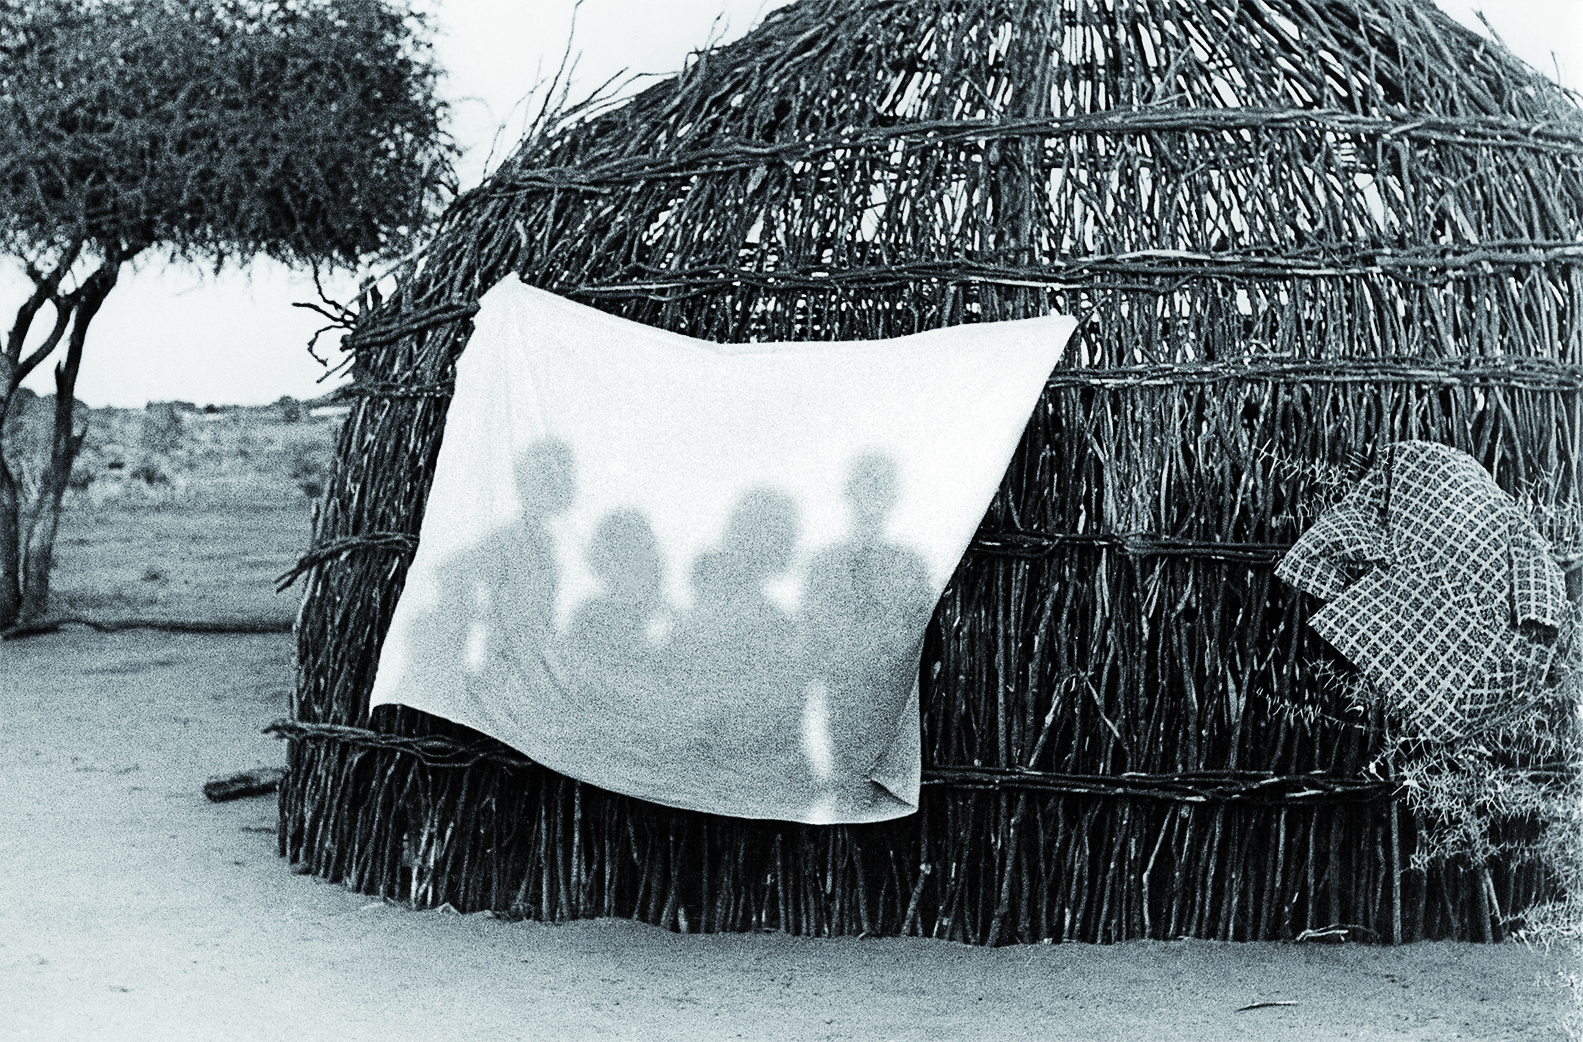 Jeux d'ombres en Somalie/ Myriam Viallefont-Haas